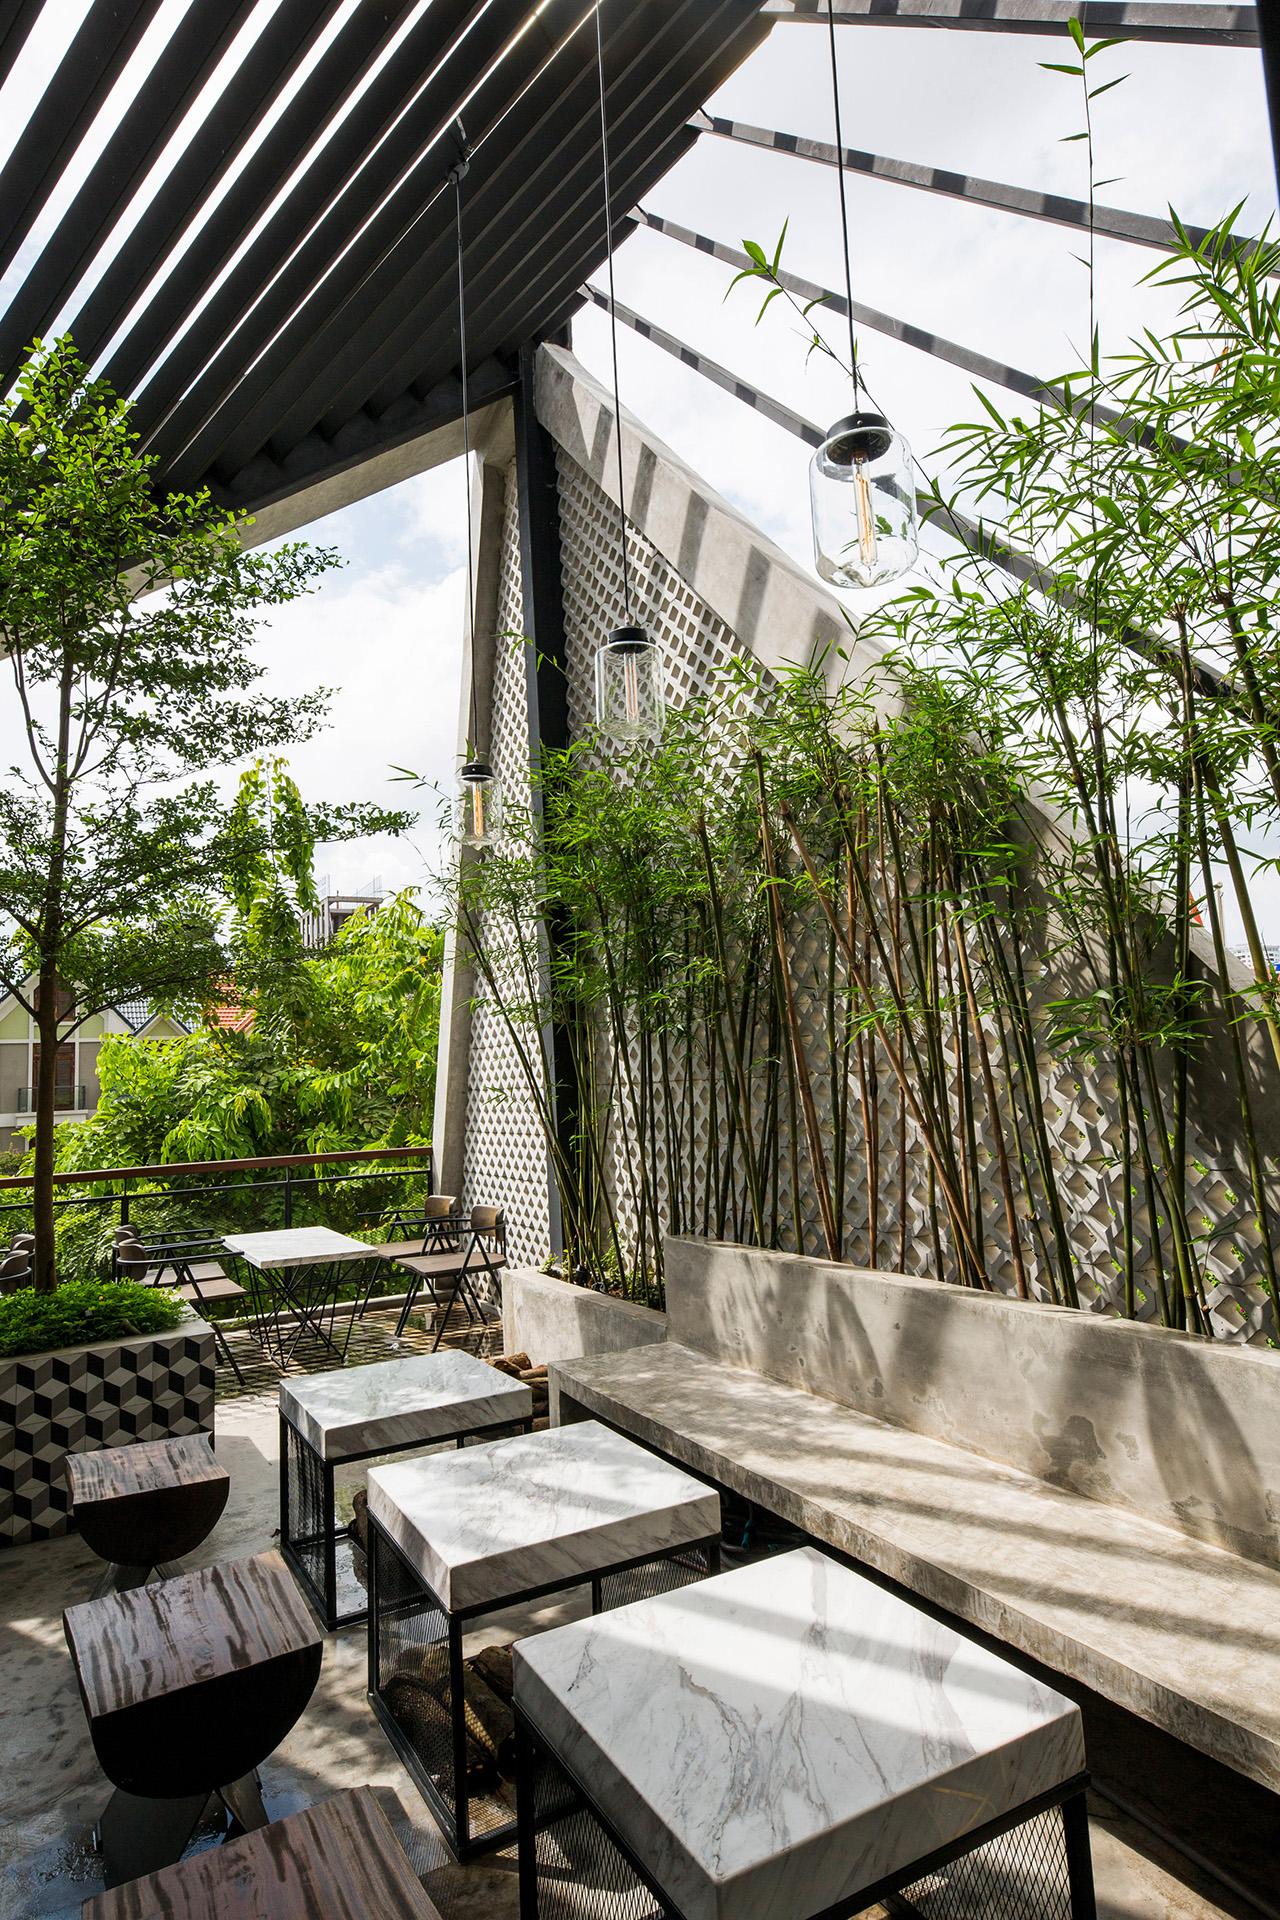 an-garden-cafe-le-house-architecture-public-and-leisure-vietname-hanoi_dezeen_2364_col_1_1280px.jpg